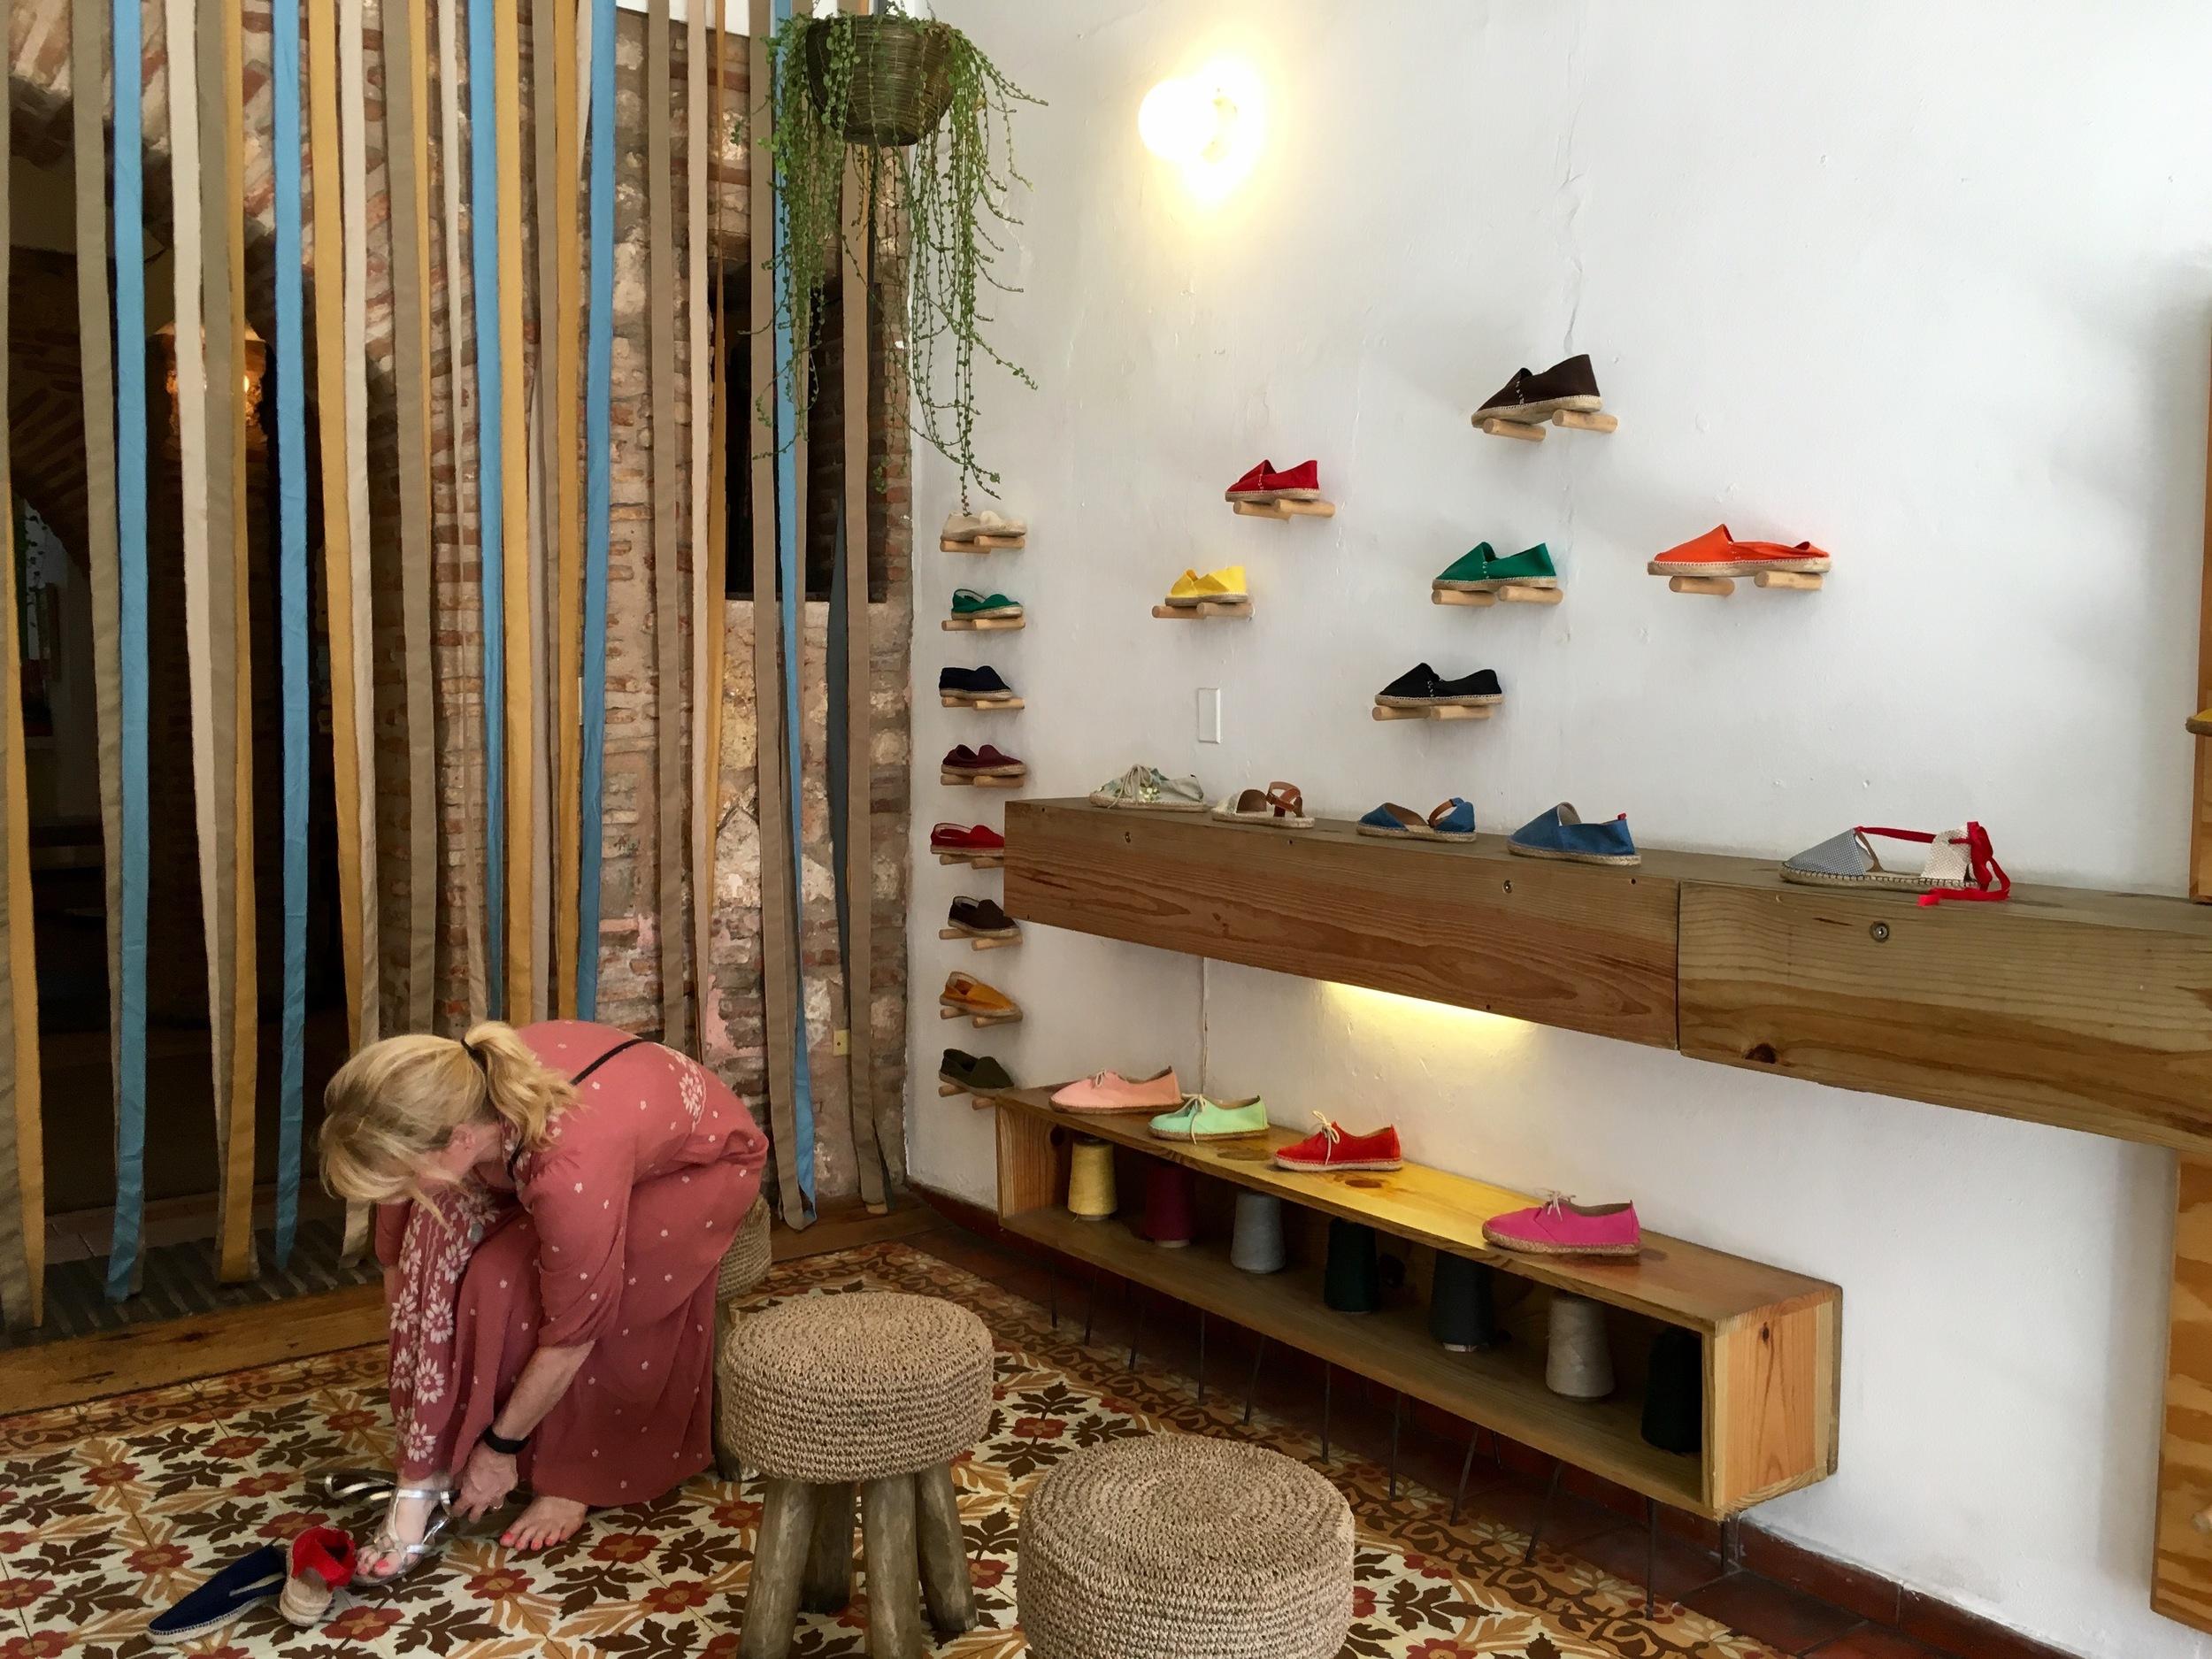 Shoe Shopping at La Alpargateria